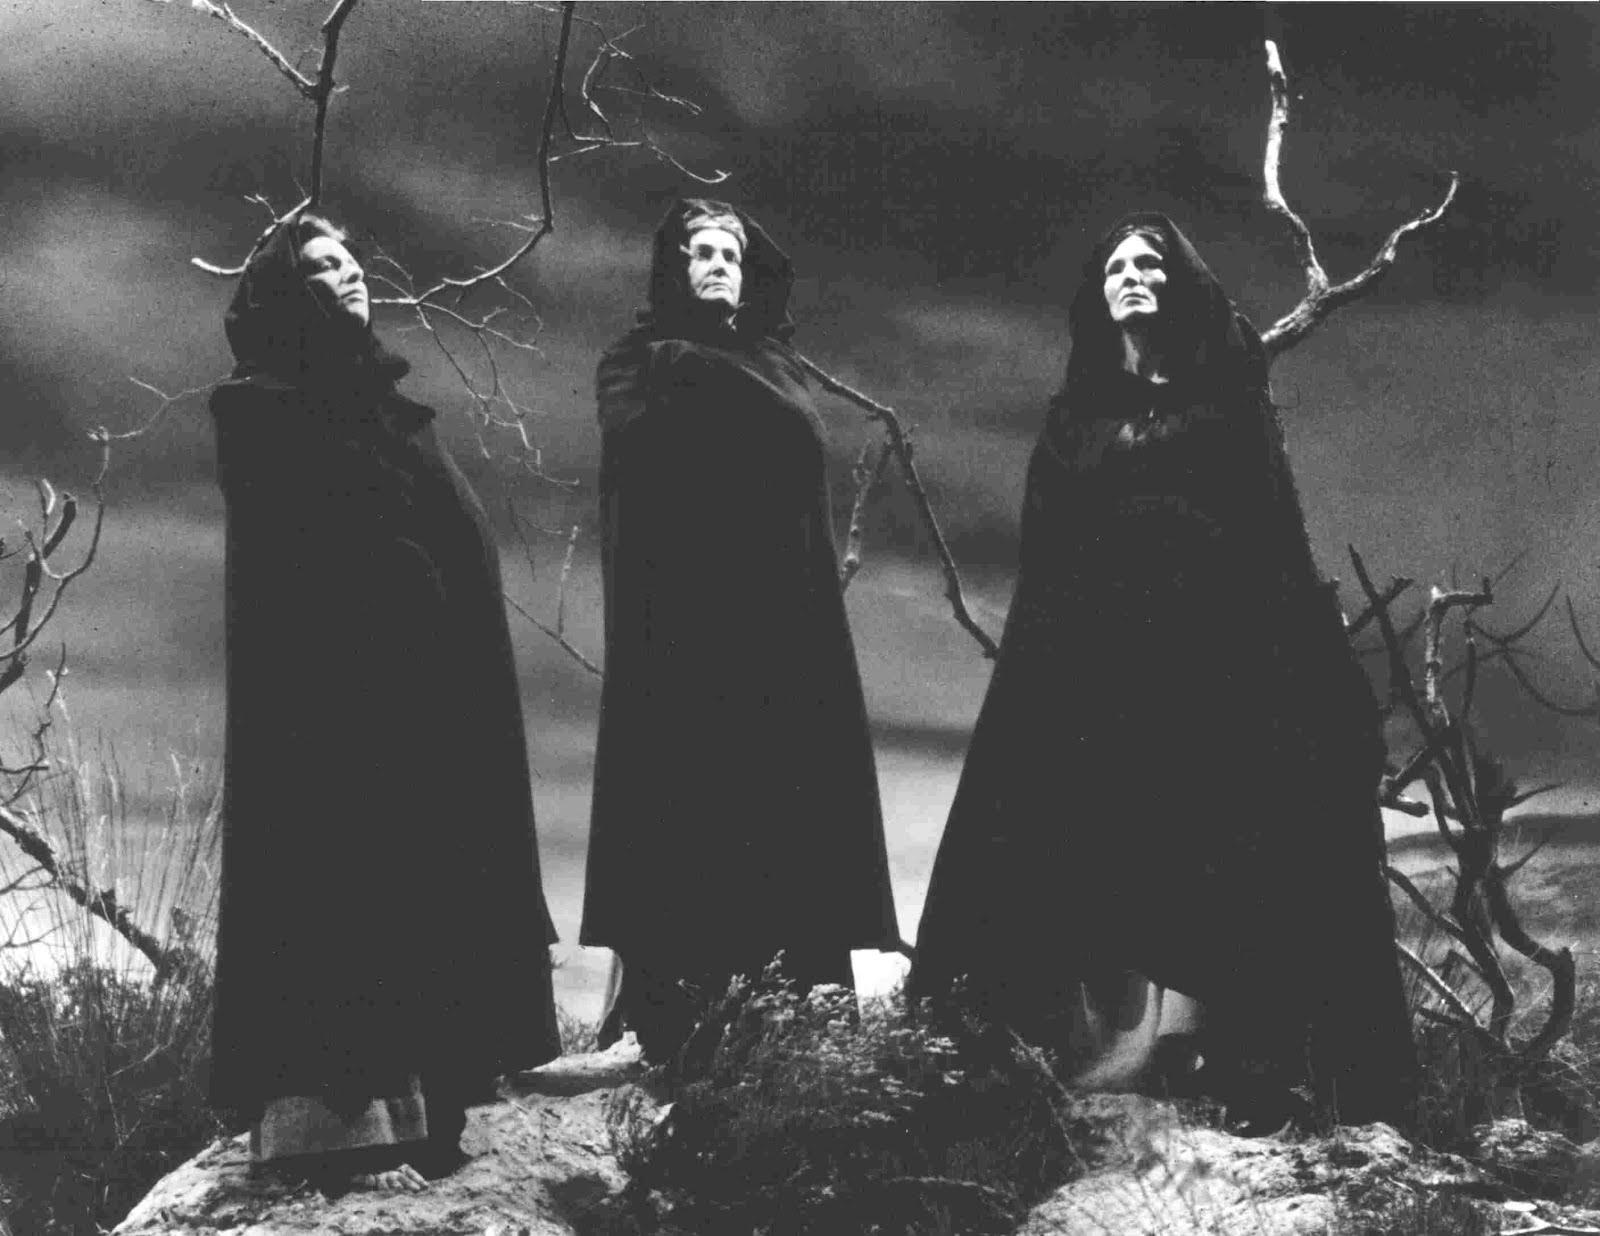 macbeth-three-witches